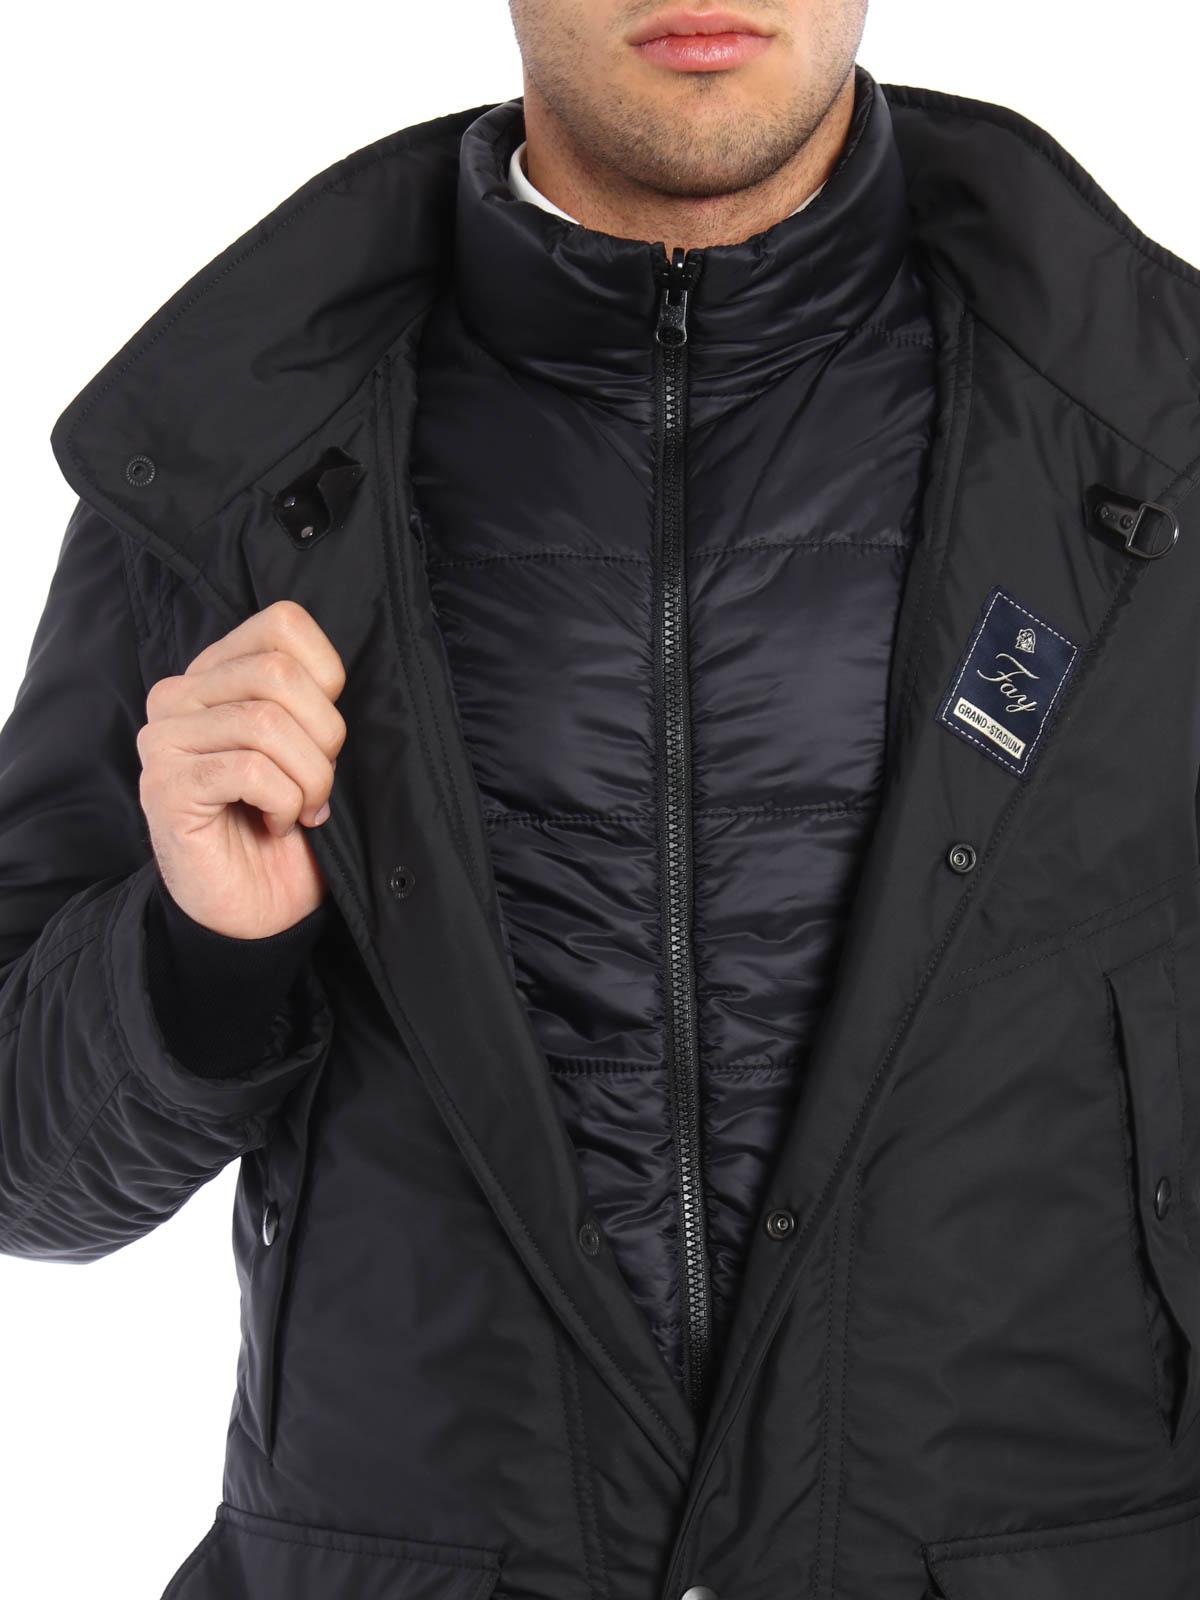 buy cheap c383f 5666e Fay - Giaccone con gilet imbottito - giacche imbottite ...